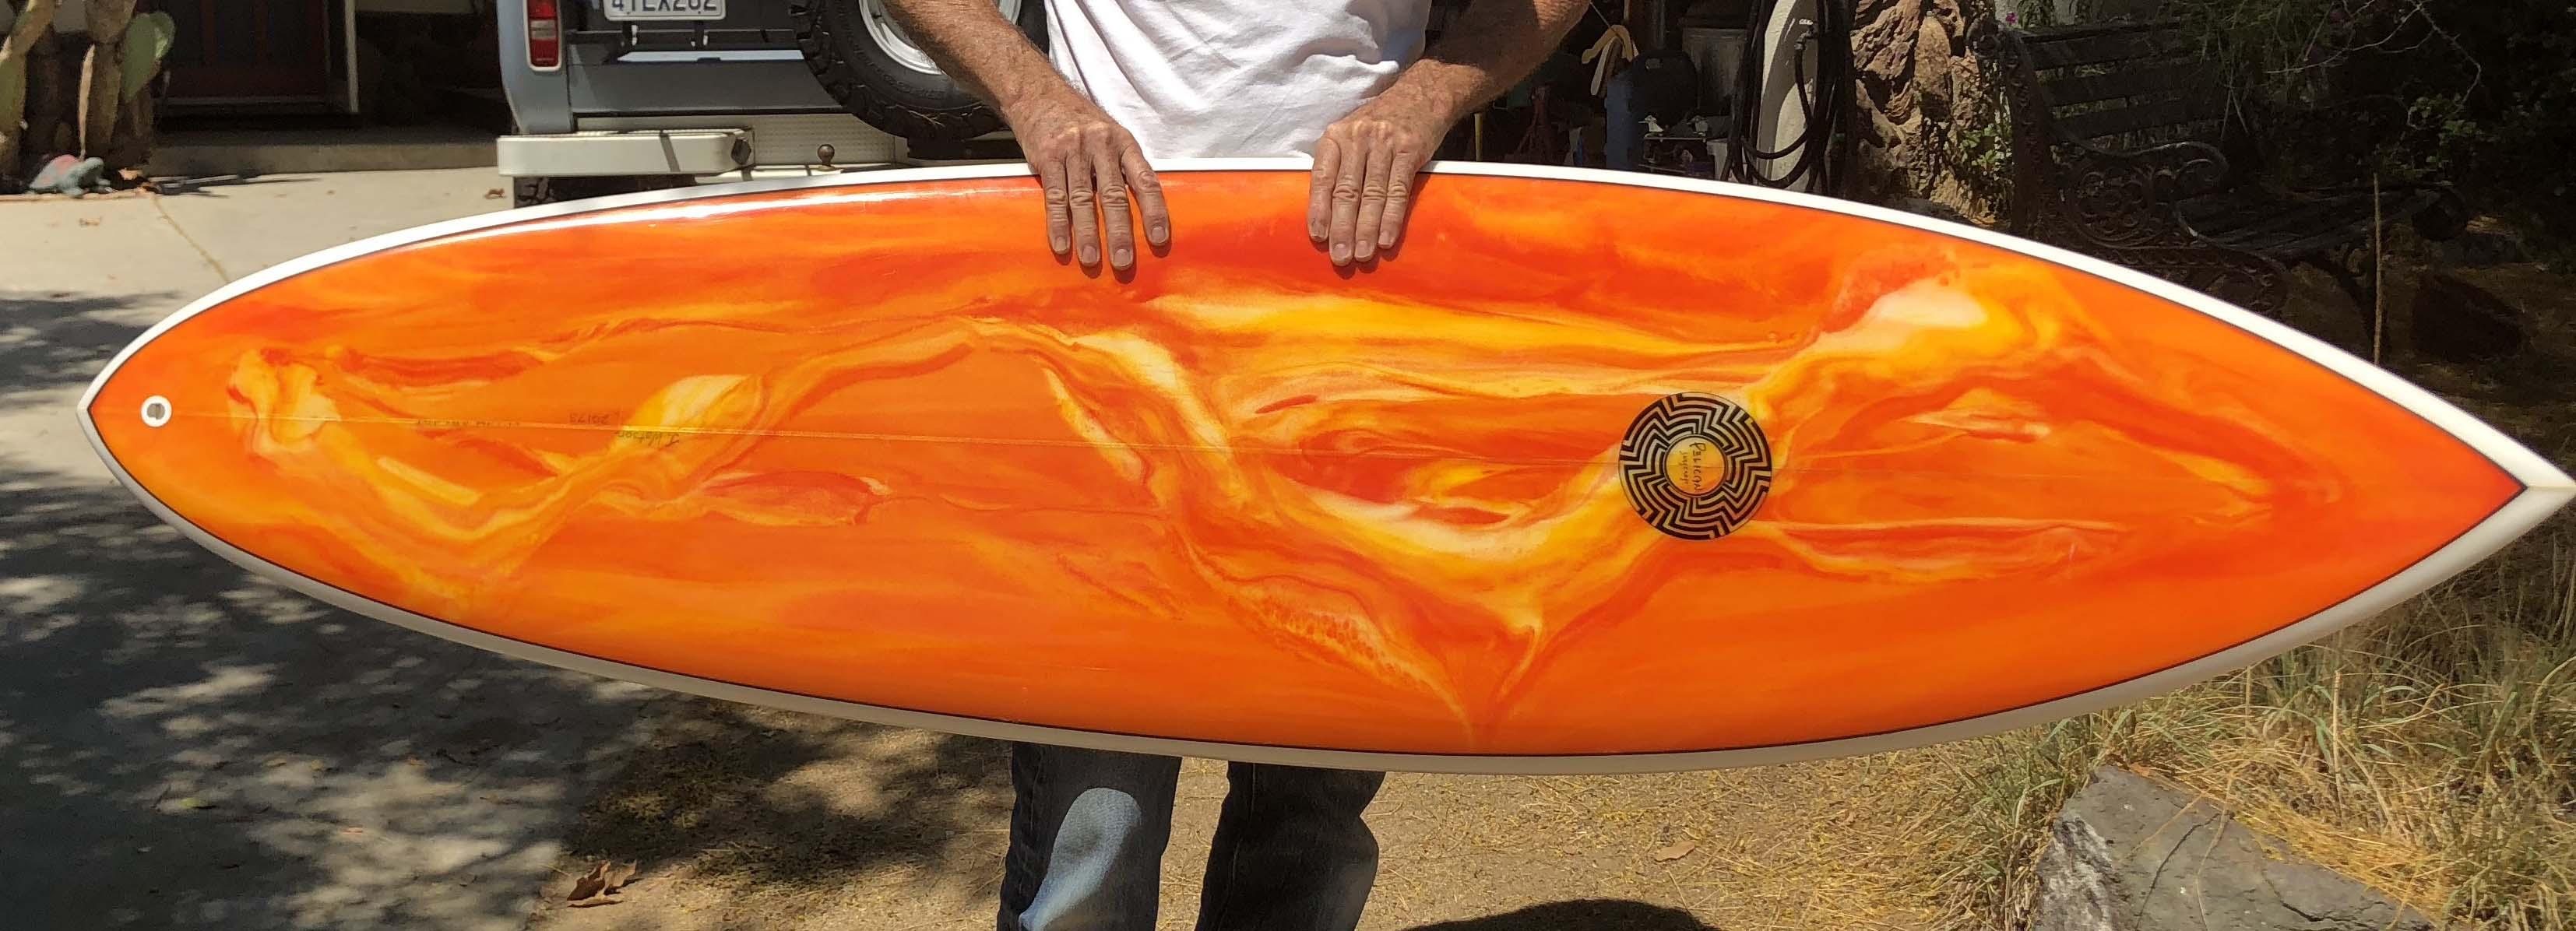 Flame swirl deck